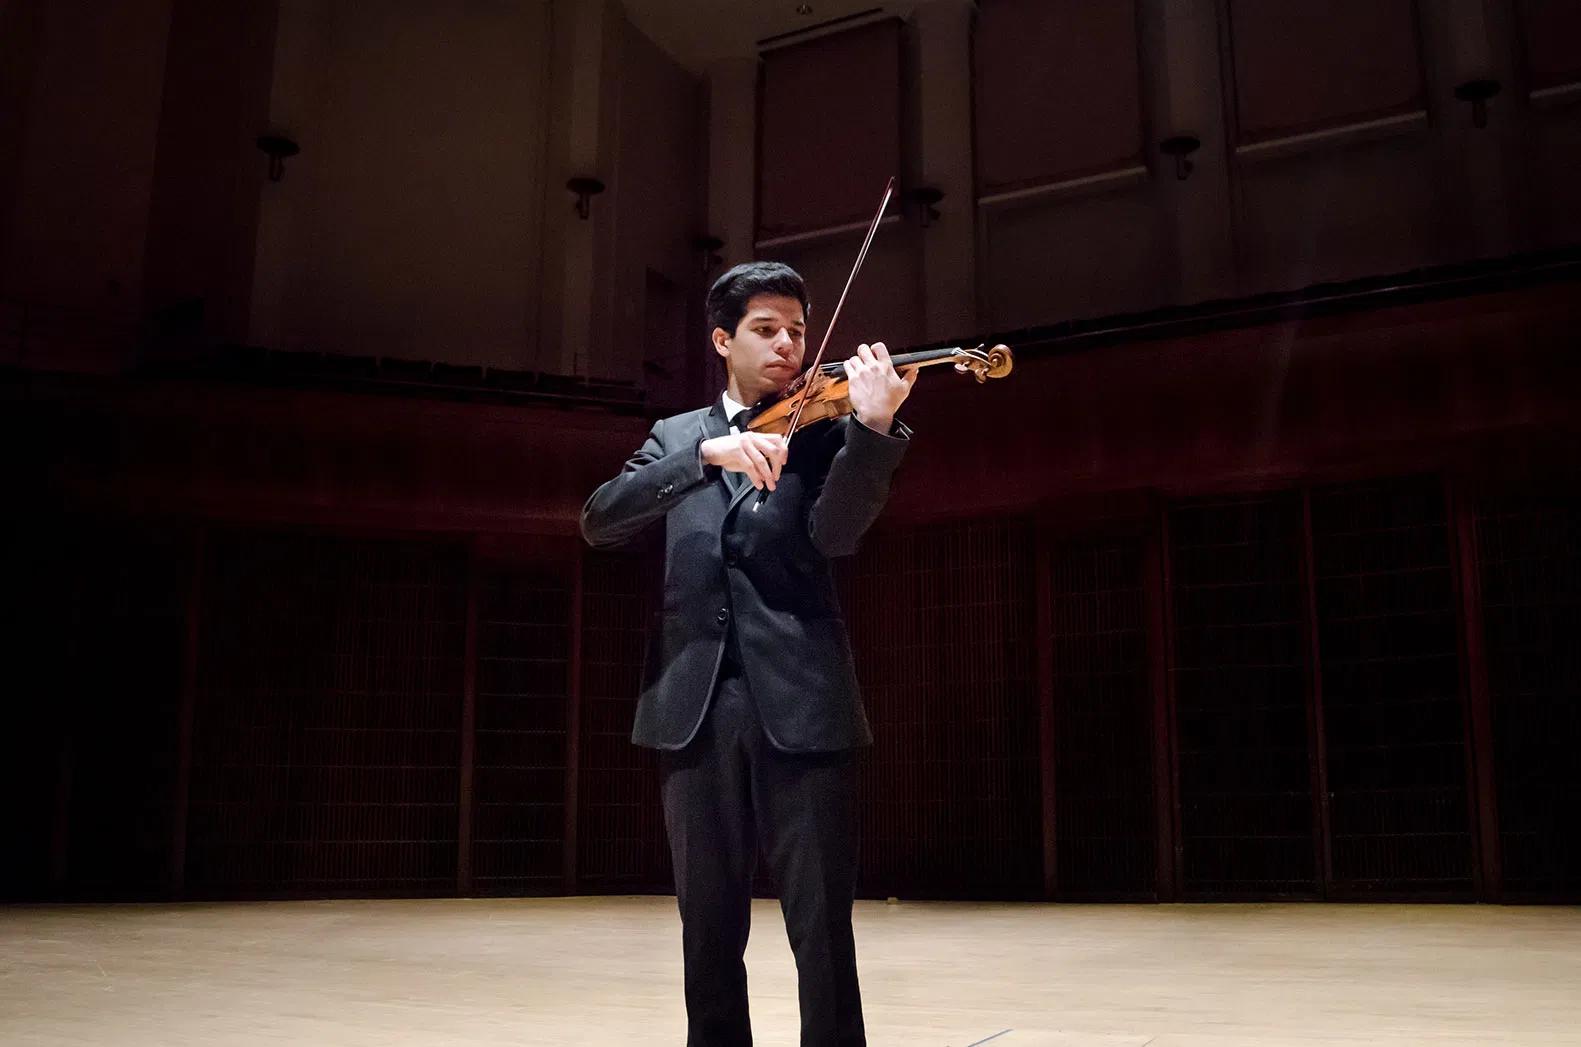 Ruben Rengel on stage playing violin